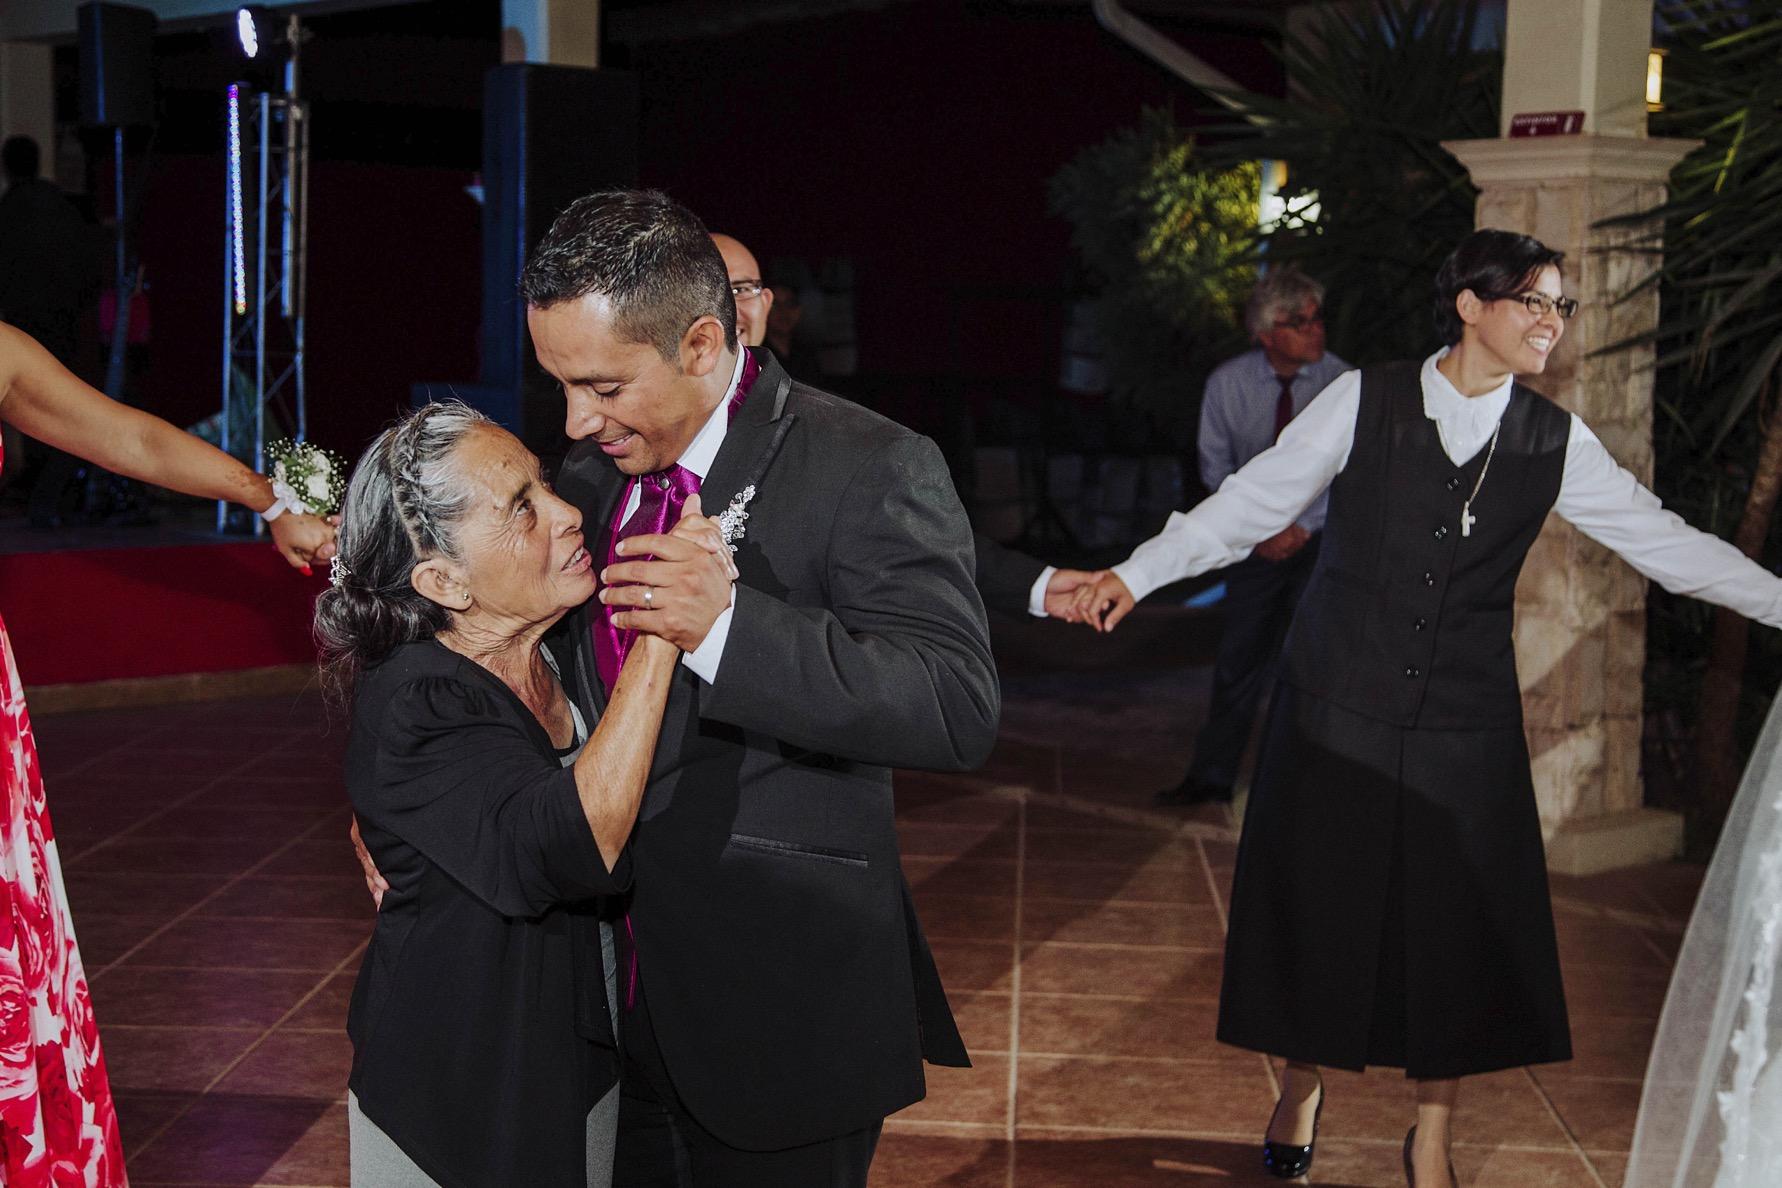 fotografo_profesional_bodas_xv_chihuahua_zacatecas_mexico-45